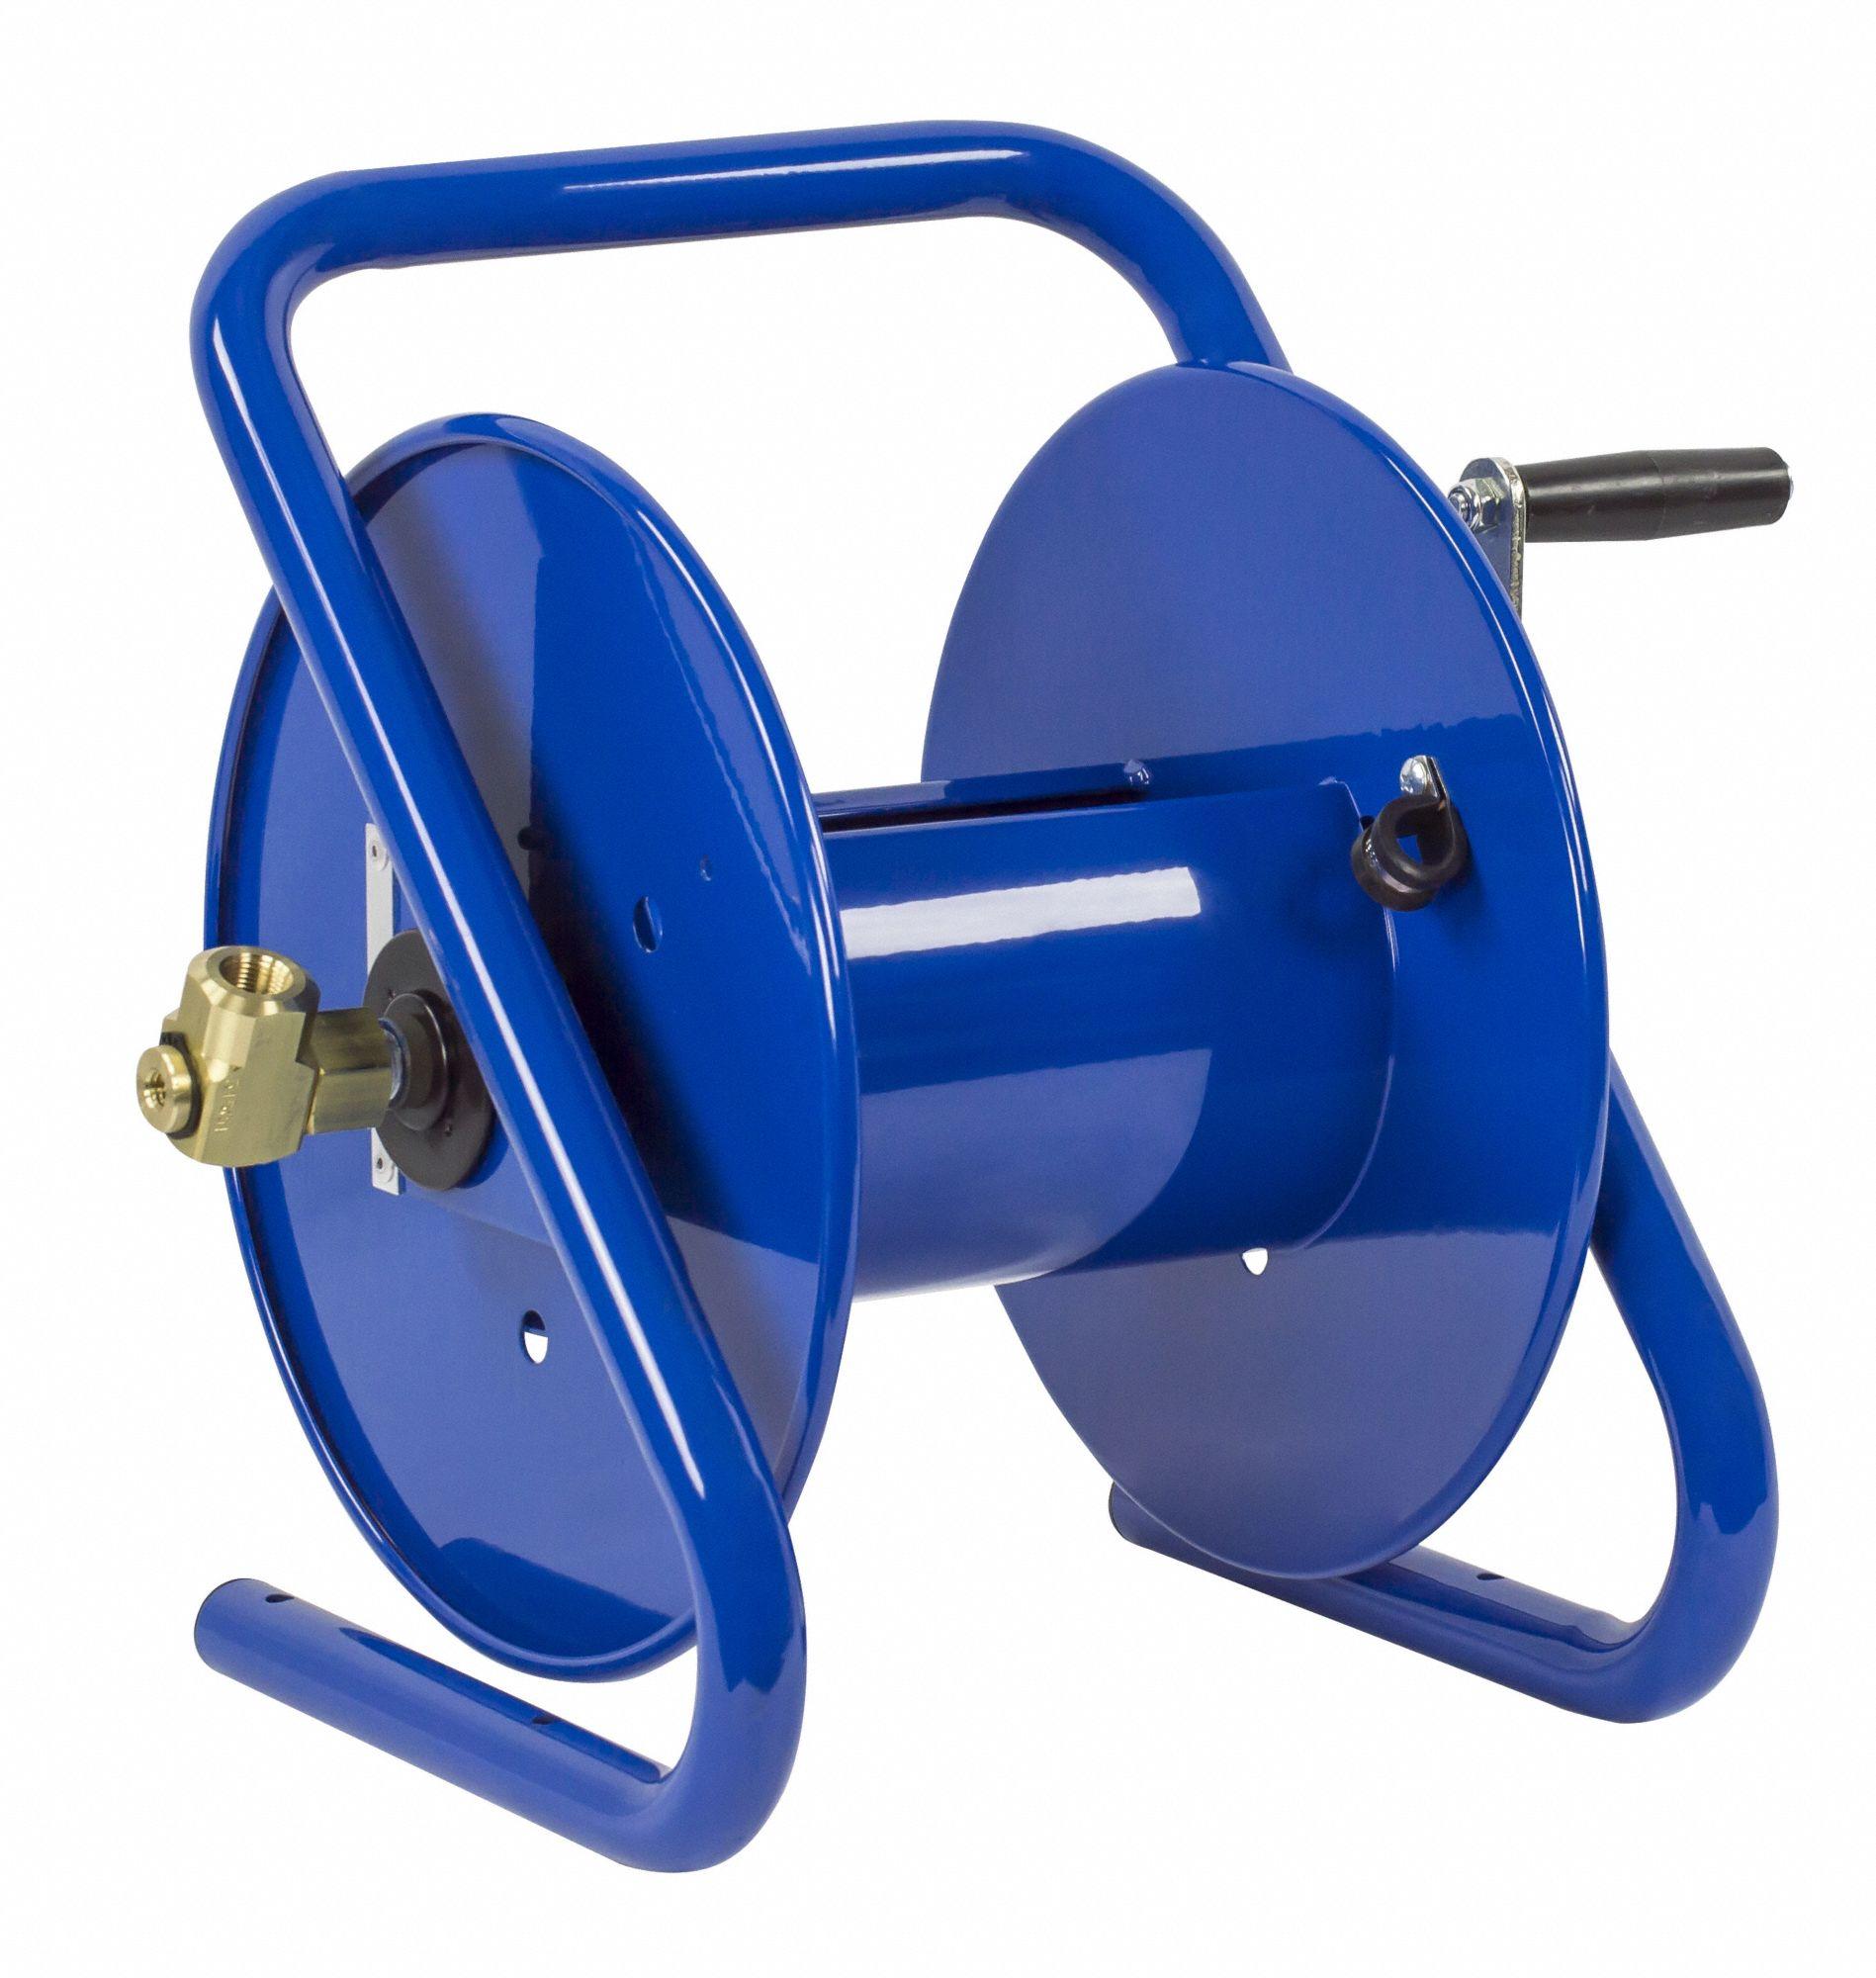 Capacity Viton Seals 100ft 4000 PSI Model Number 112-3-100-BVXX x 3//8in Coxreels Compact Hand-Crank Hose Reel